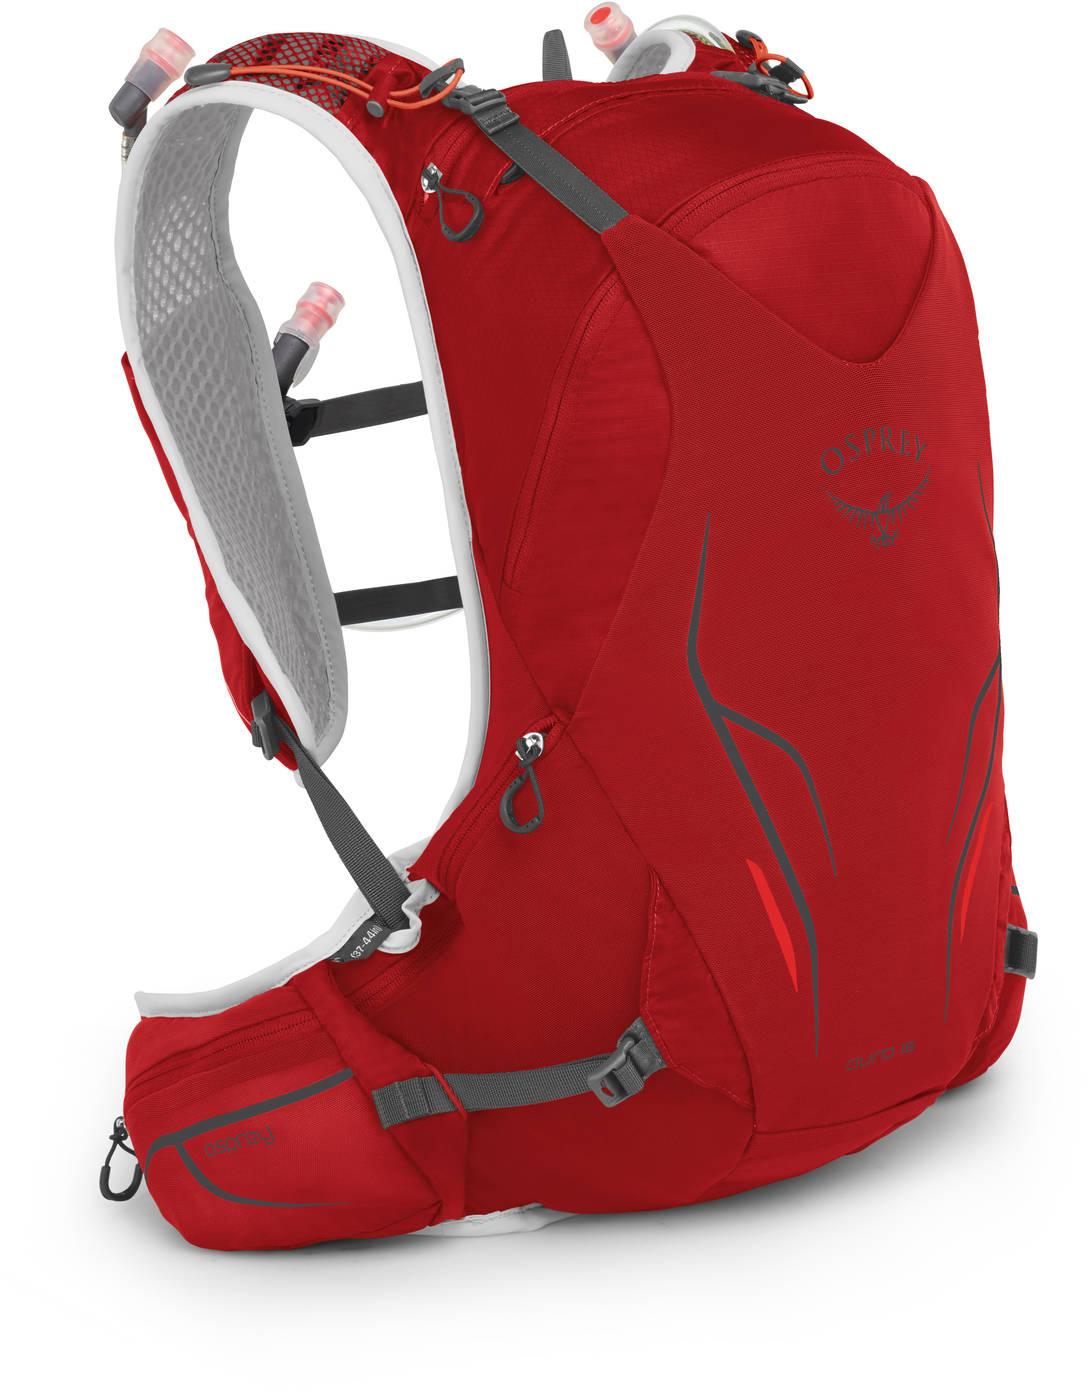 Рюкзаки для бега Рюкзак беговой Osprey Duro 15 Phoenix Red Duro_15_S19_Side_Phoenix_Red_web.jpg